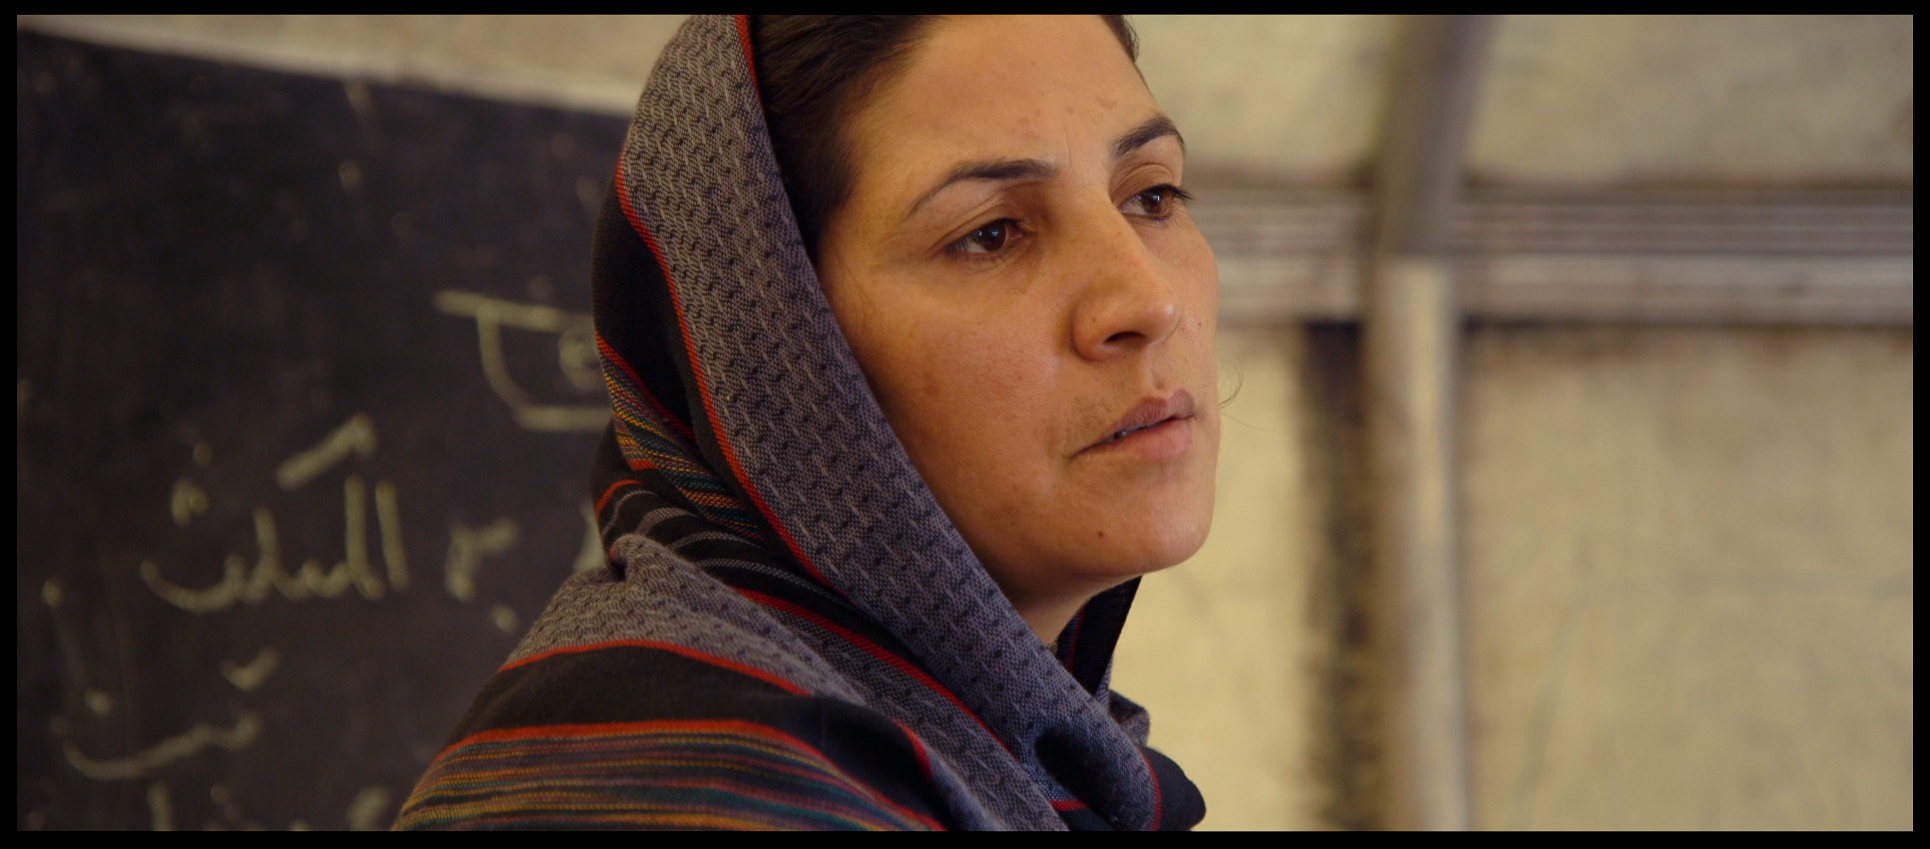 Film still: Teacher Fazula at the Daqiqi Balkhi school. Teacher Fazula's three oldest sons - Rostam, Sohrab and Yaldash - feature in Angels Are Made Of Light